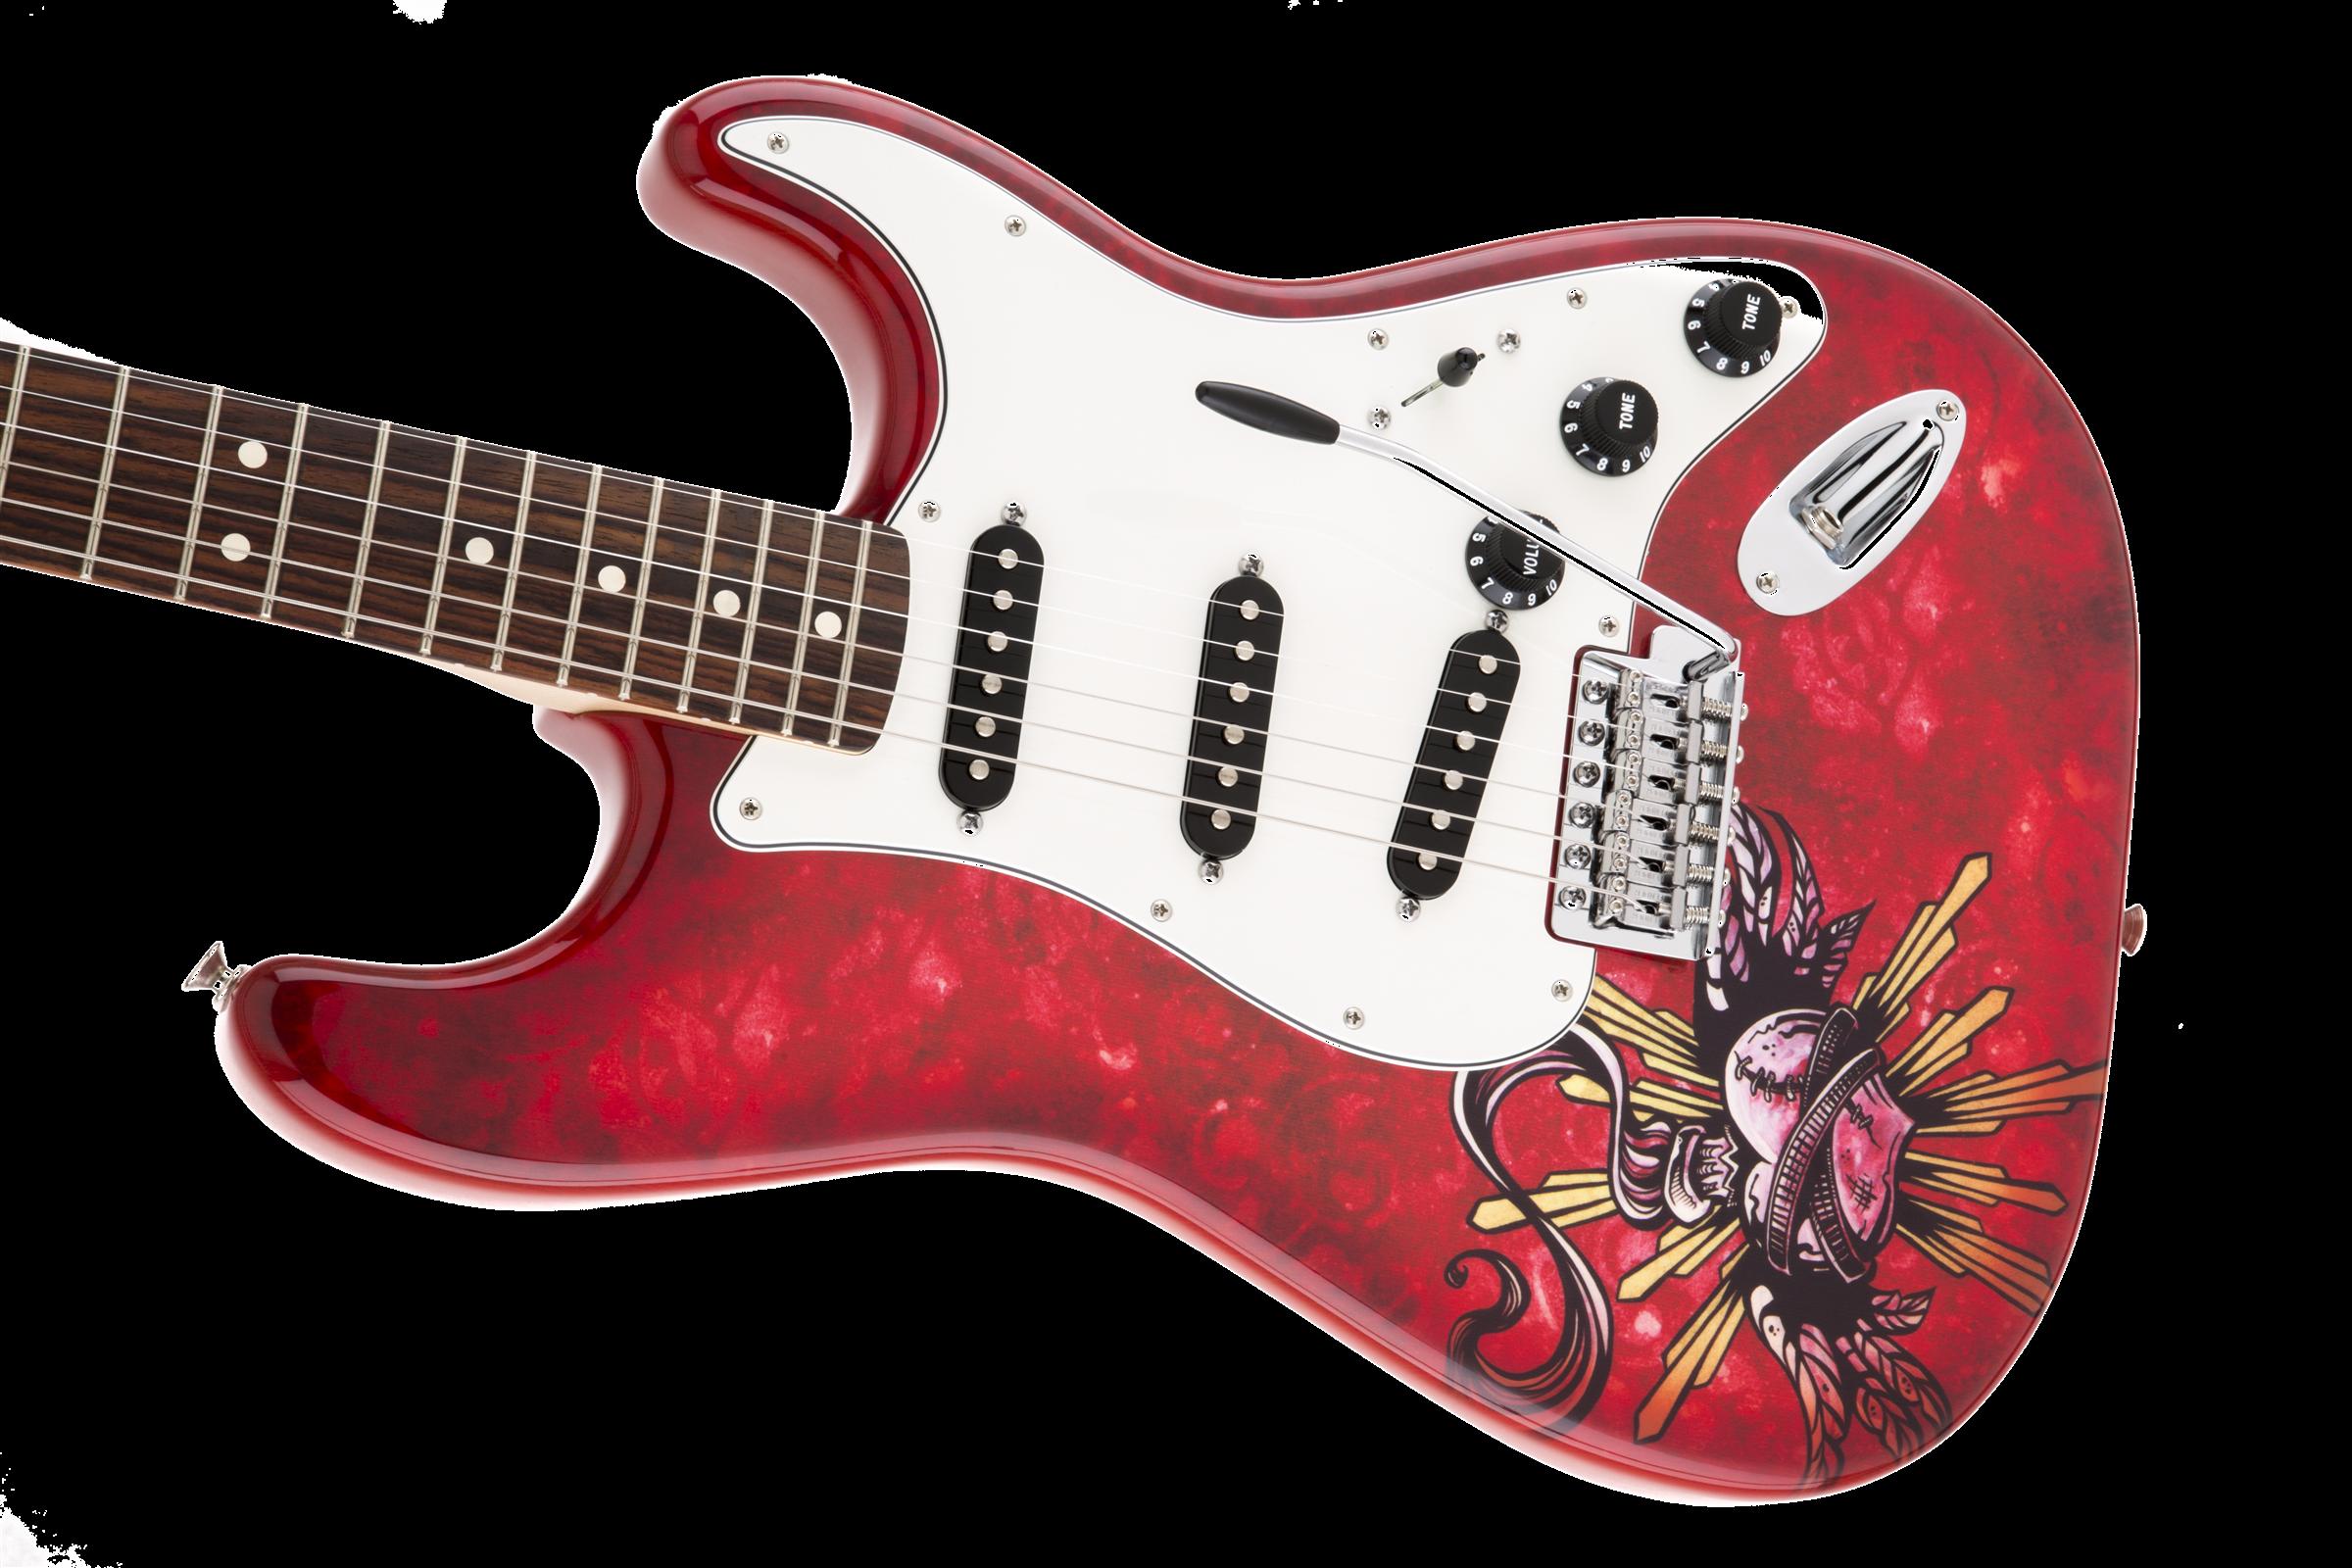 David Lozeau Art Stratocaster Fender Electric Guitars David Lozeau David Lozeau Art David